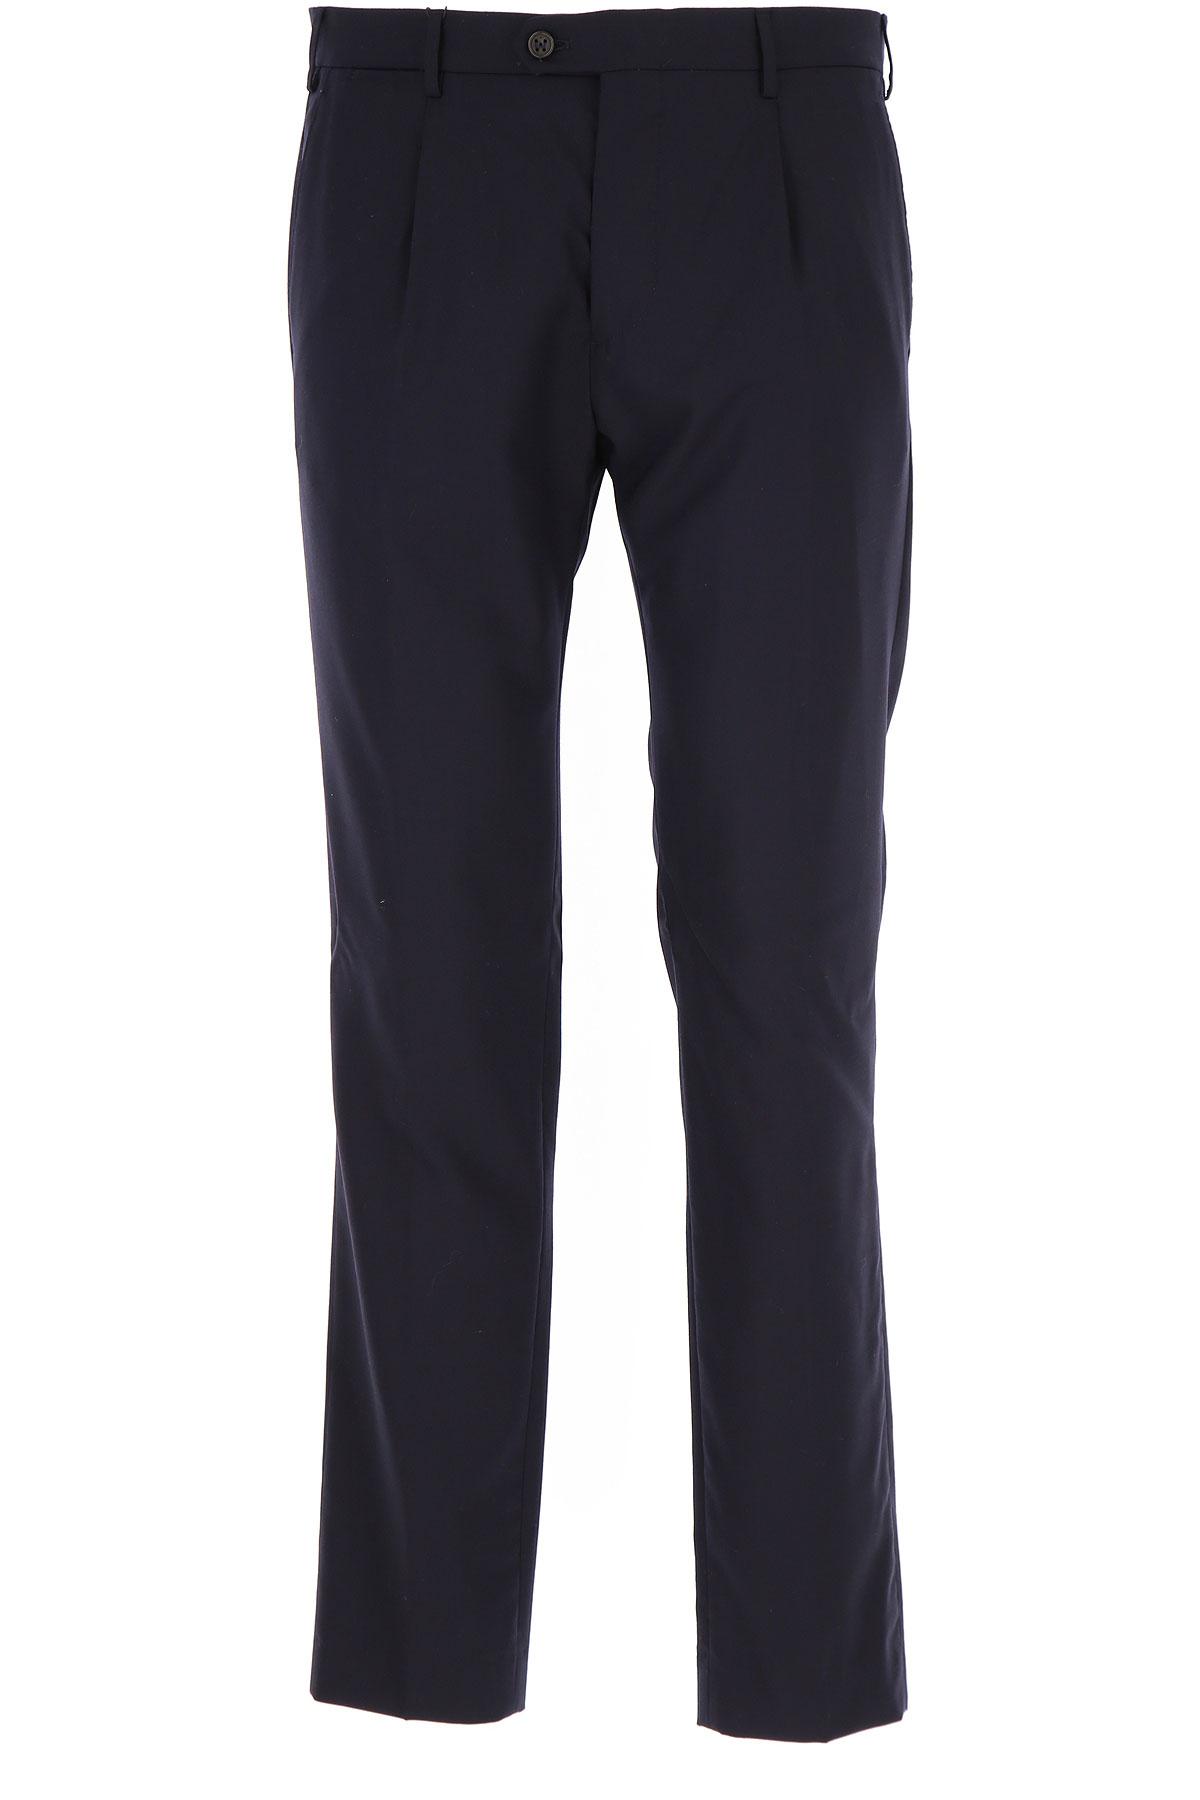 Image of Berwich Pants for Men, Blue Ink, Wool, 2017, 30 32 34 36 38